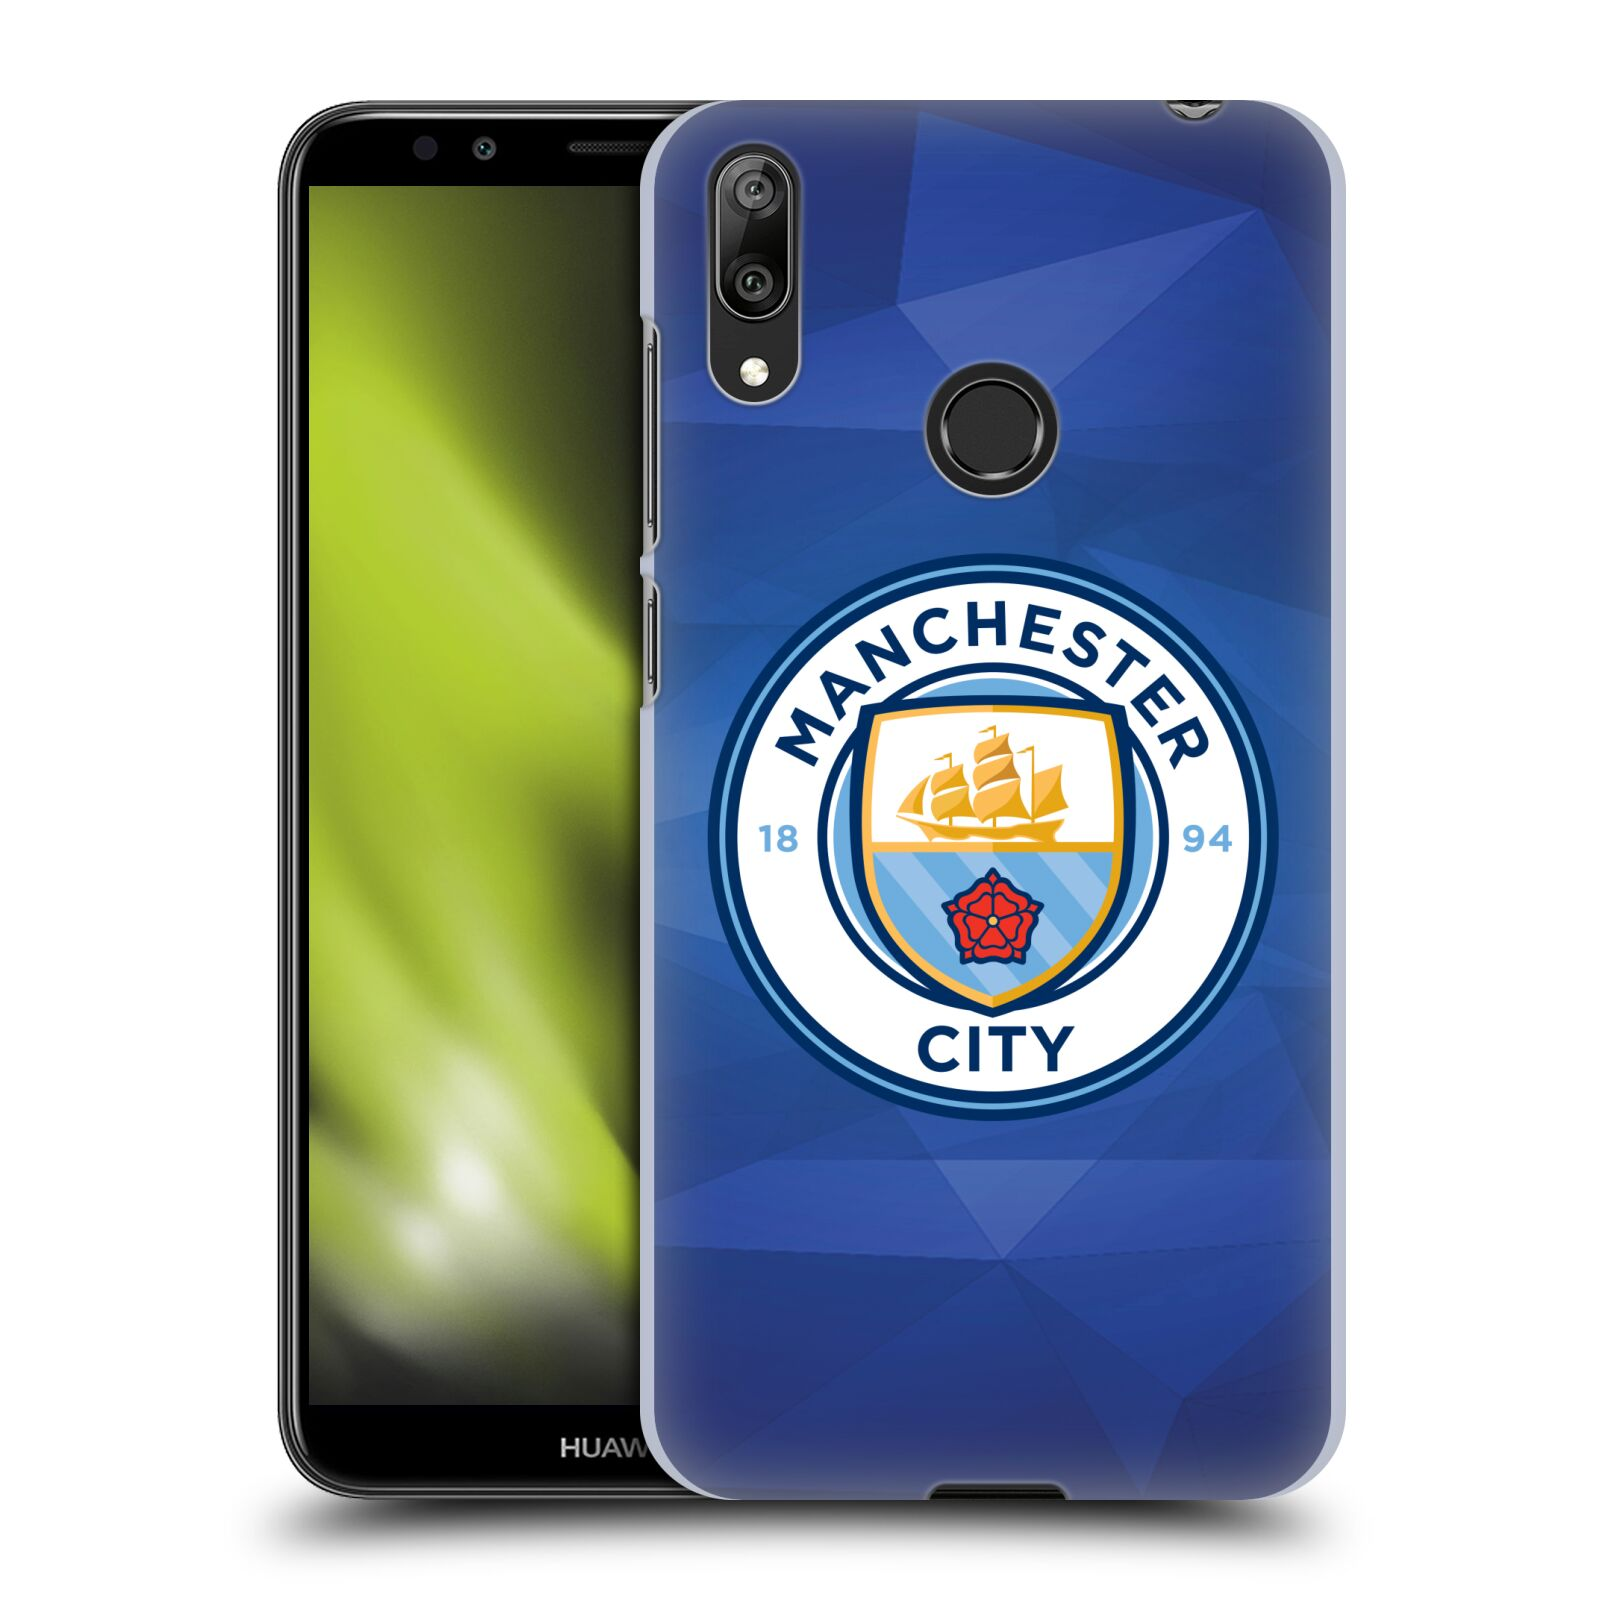 Plastové pouzdro na mobil Huawei Y7 (2019) - Head Case - Manchester City FC - Modré nové logo